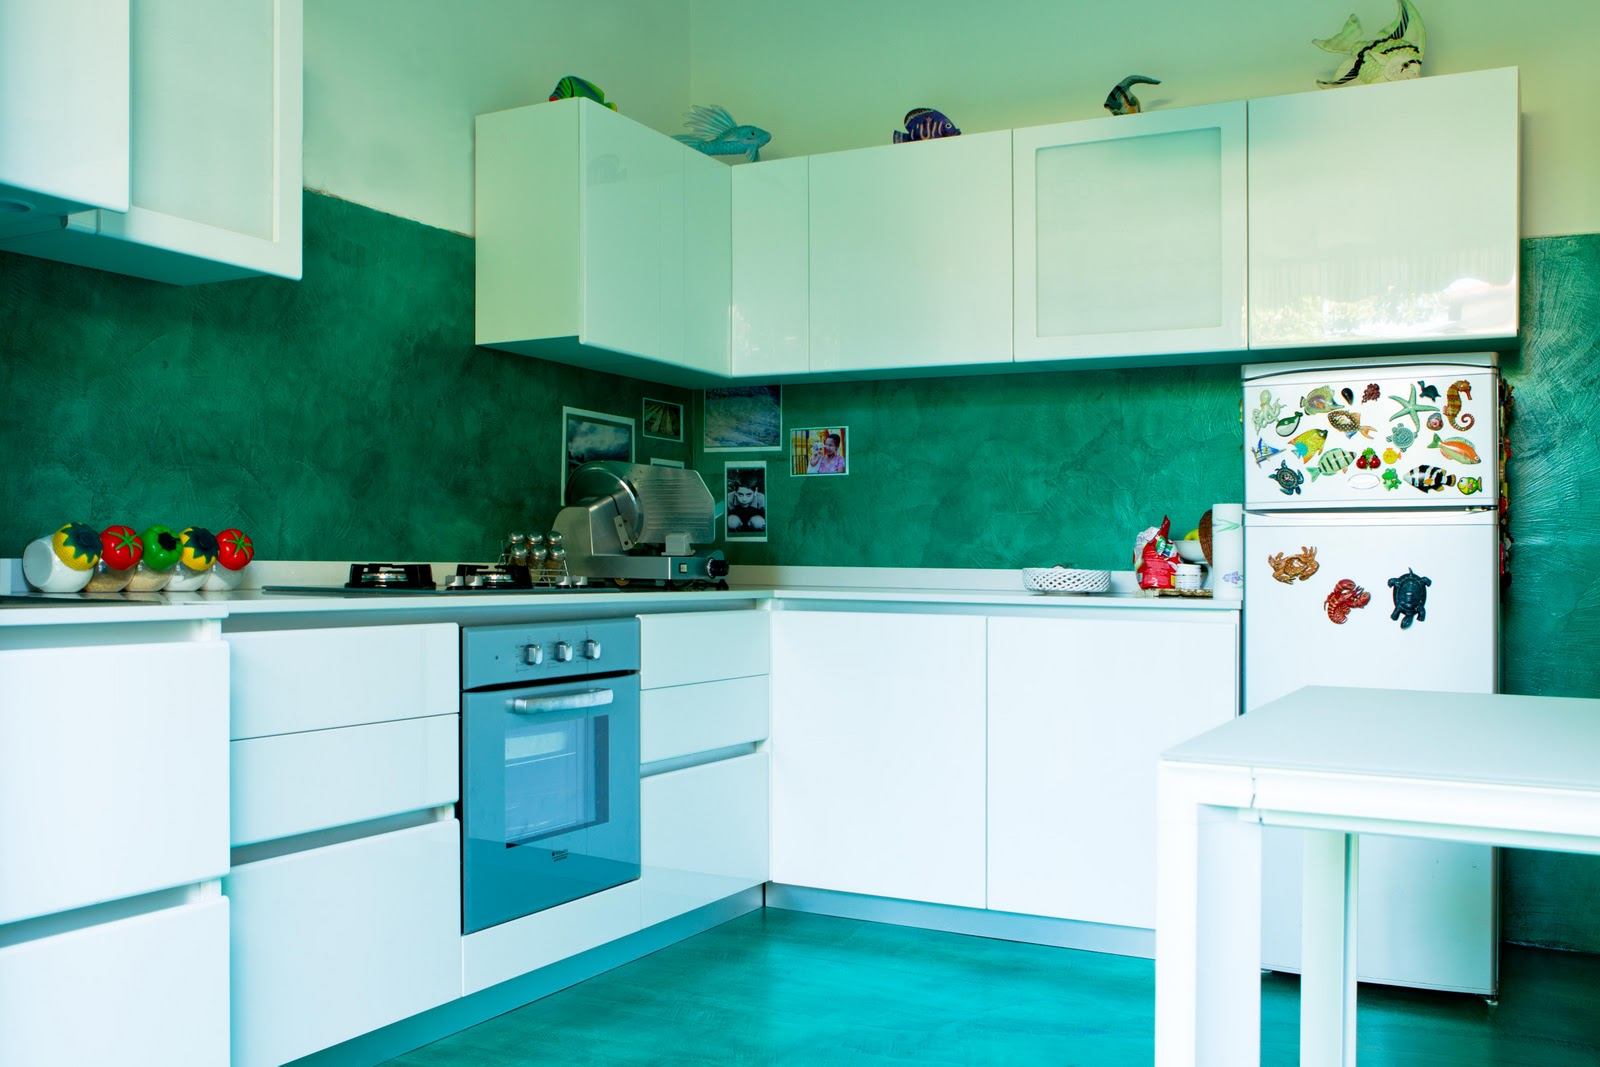 Cucina in resina parete e pavimento resin kitchen wall - Resina parete cucina ...